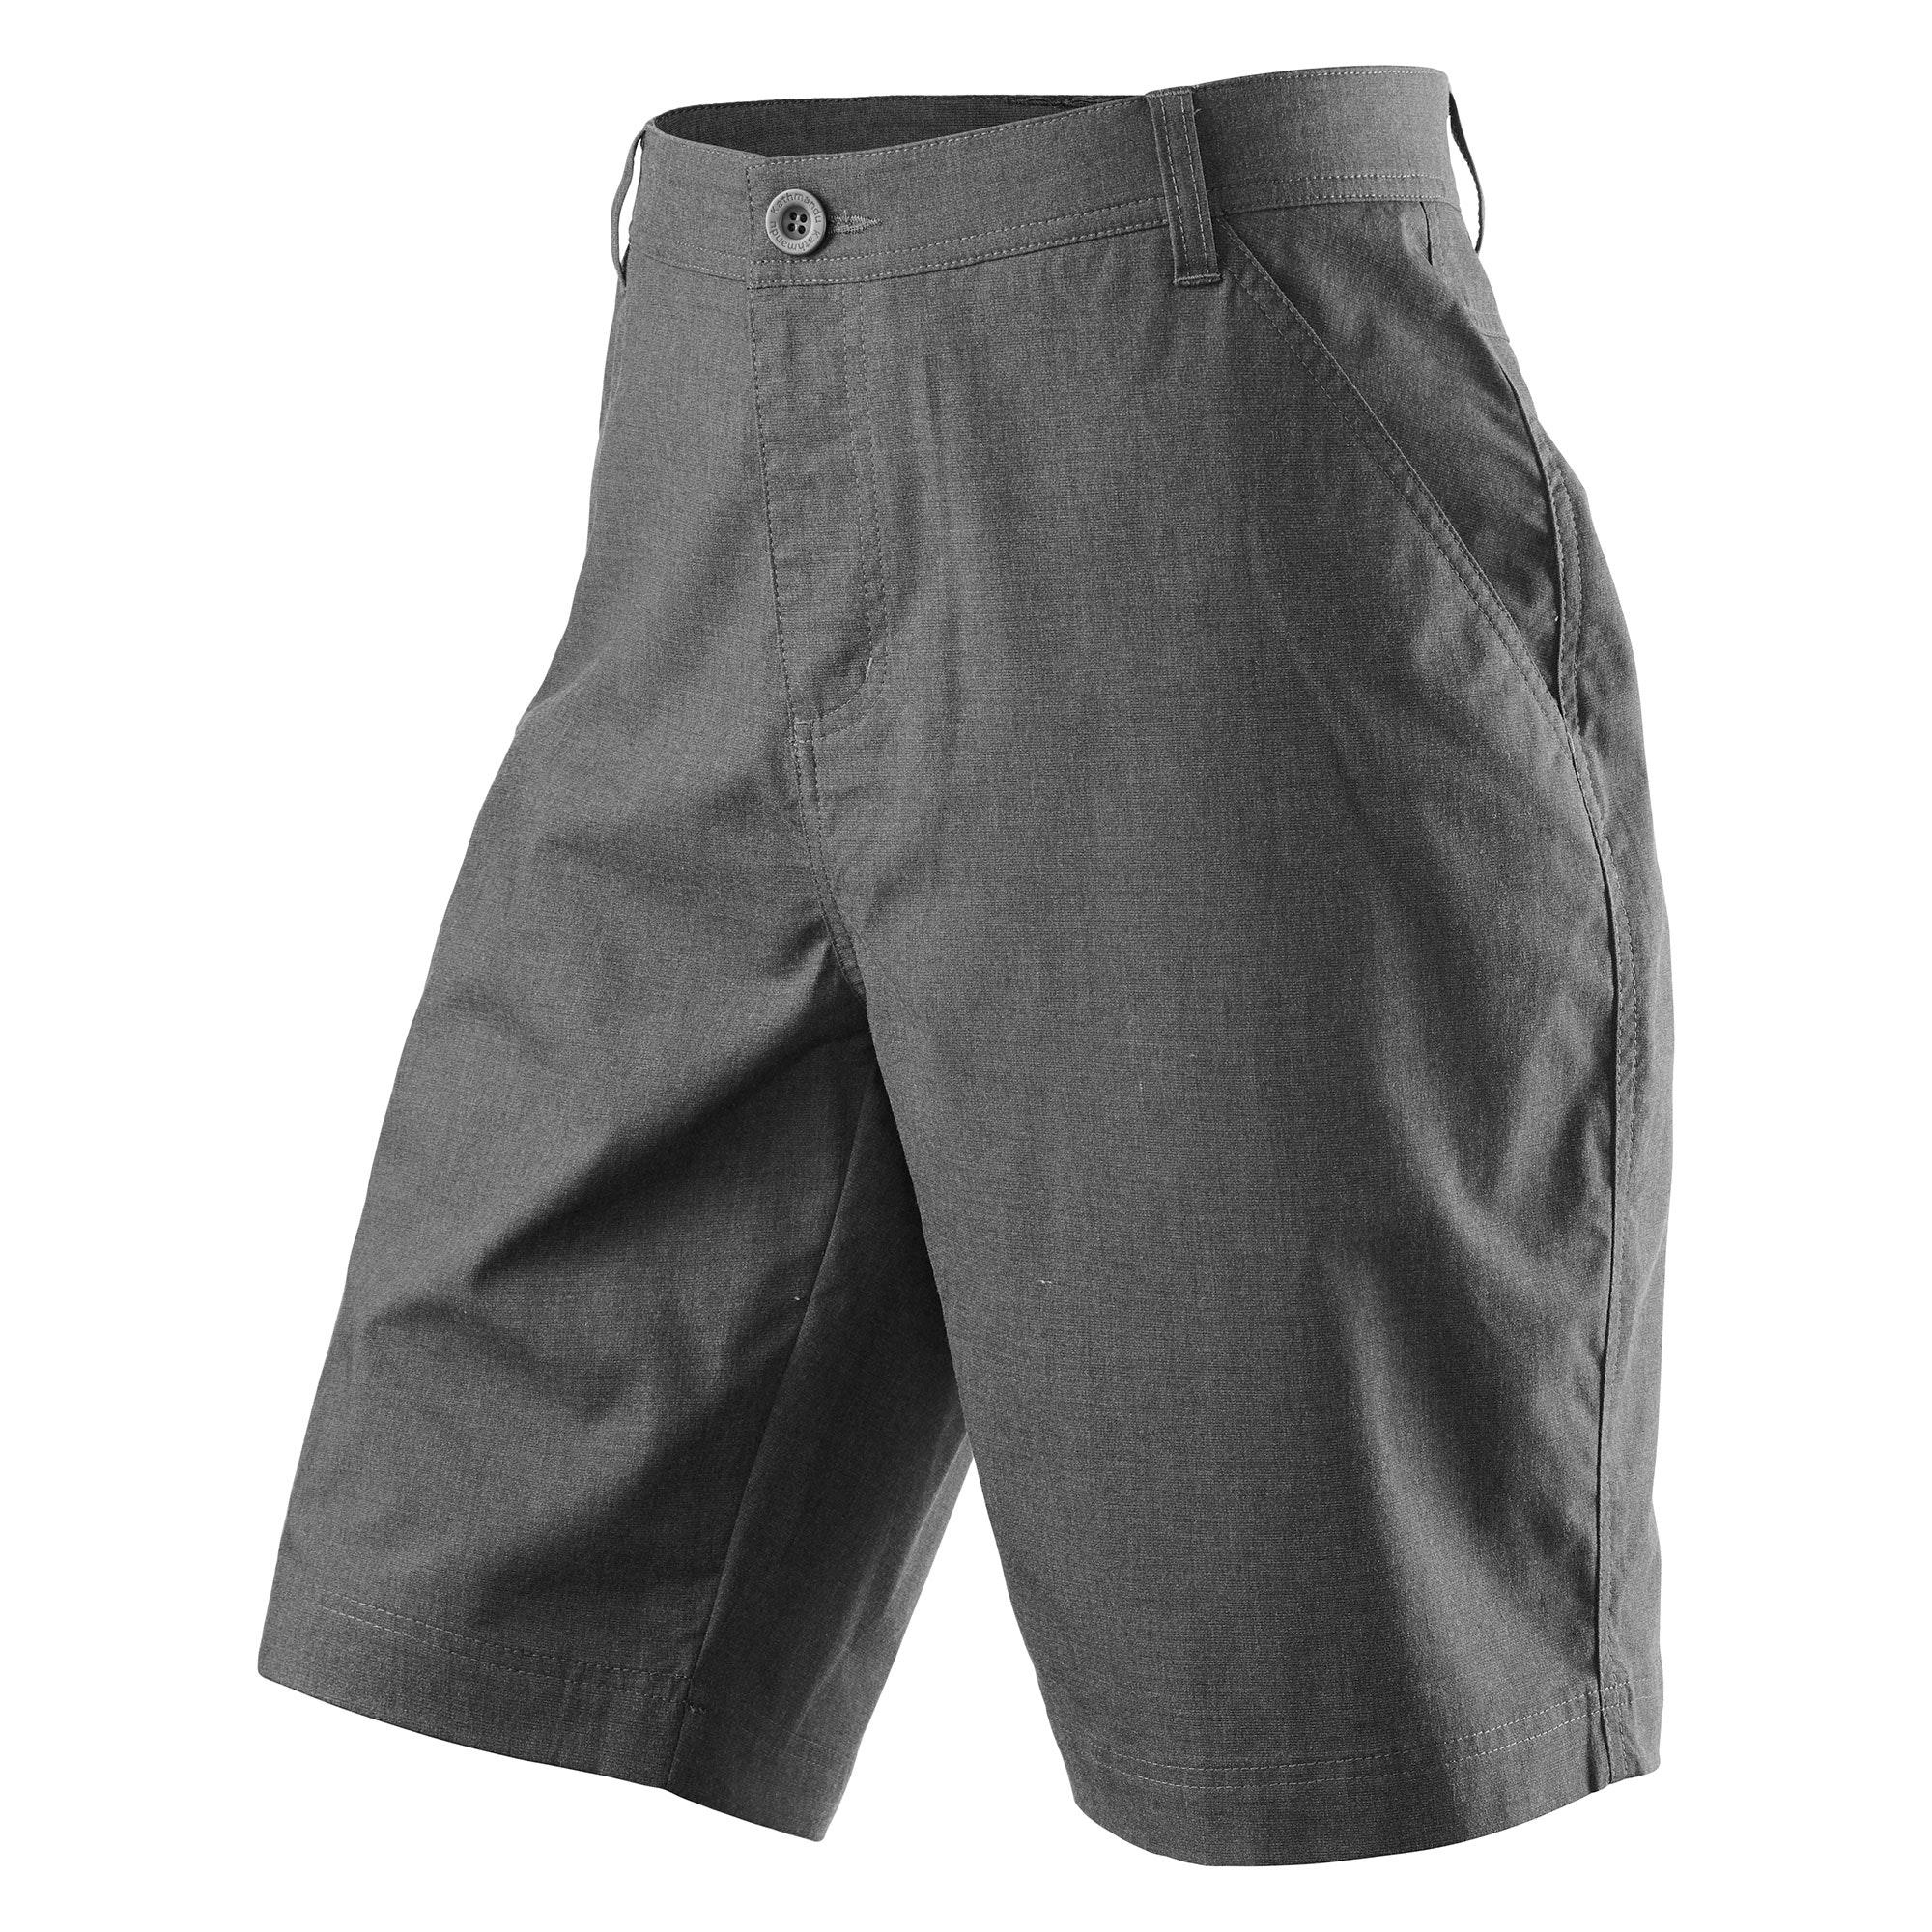 NEW-Kathmandu-Flaxton-Mens-Knee-Length-Lightweight-Cool-Casual-Travel-Shorts